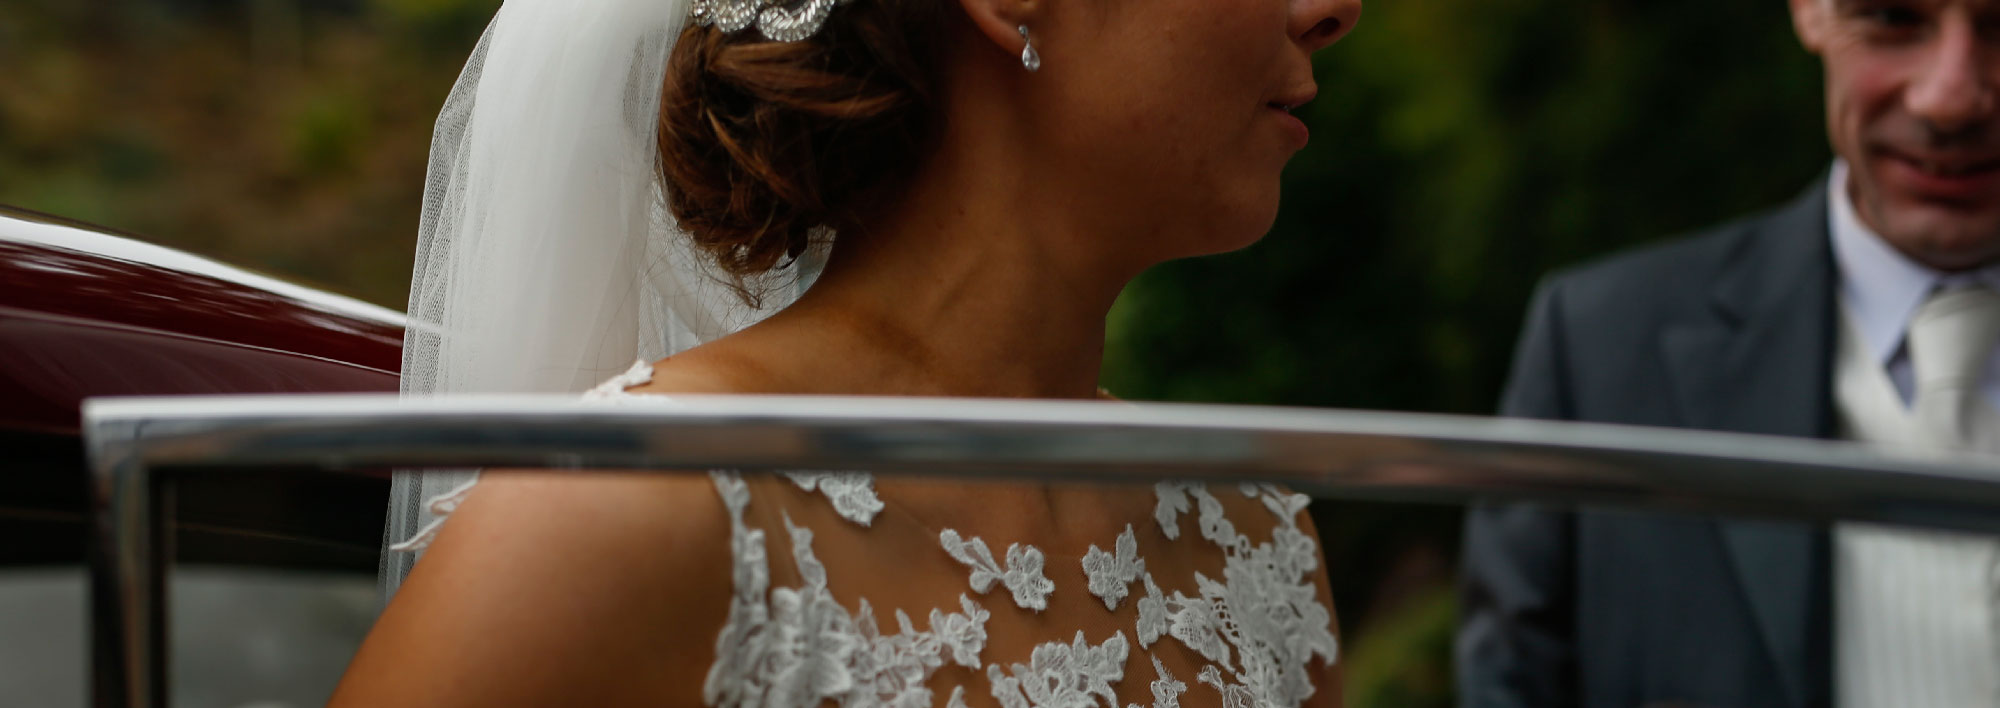 cork_wedding_photographer_23e.jpg